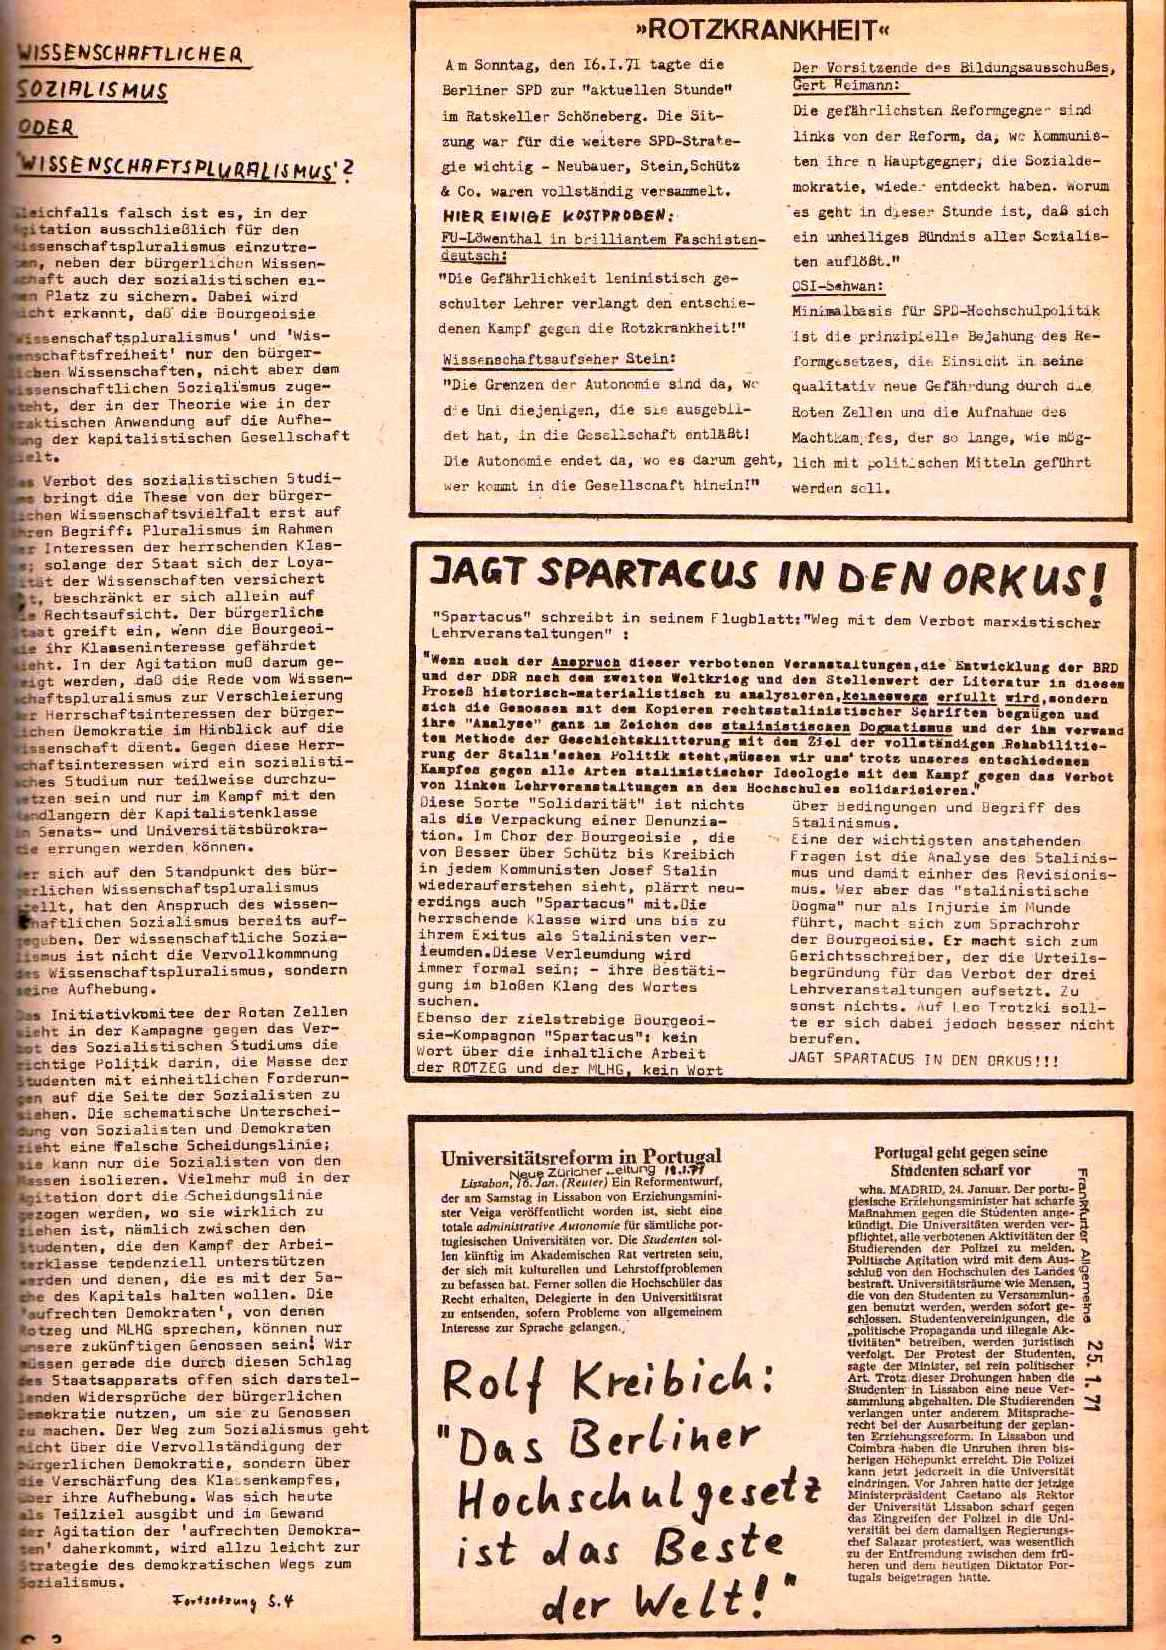 Berlin_Hochschulkampf_1971_01_03